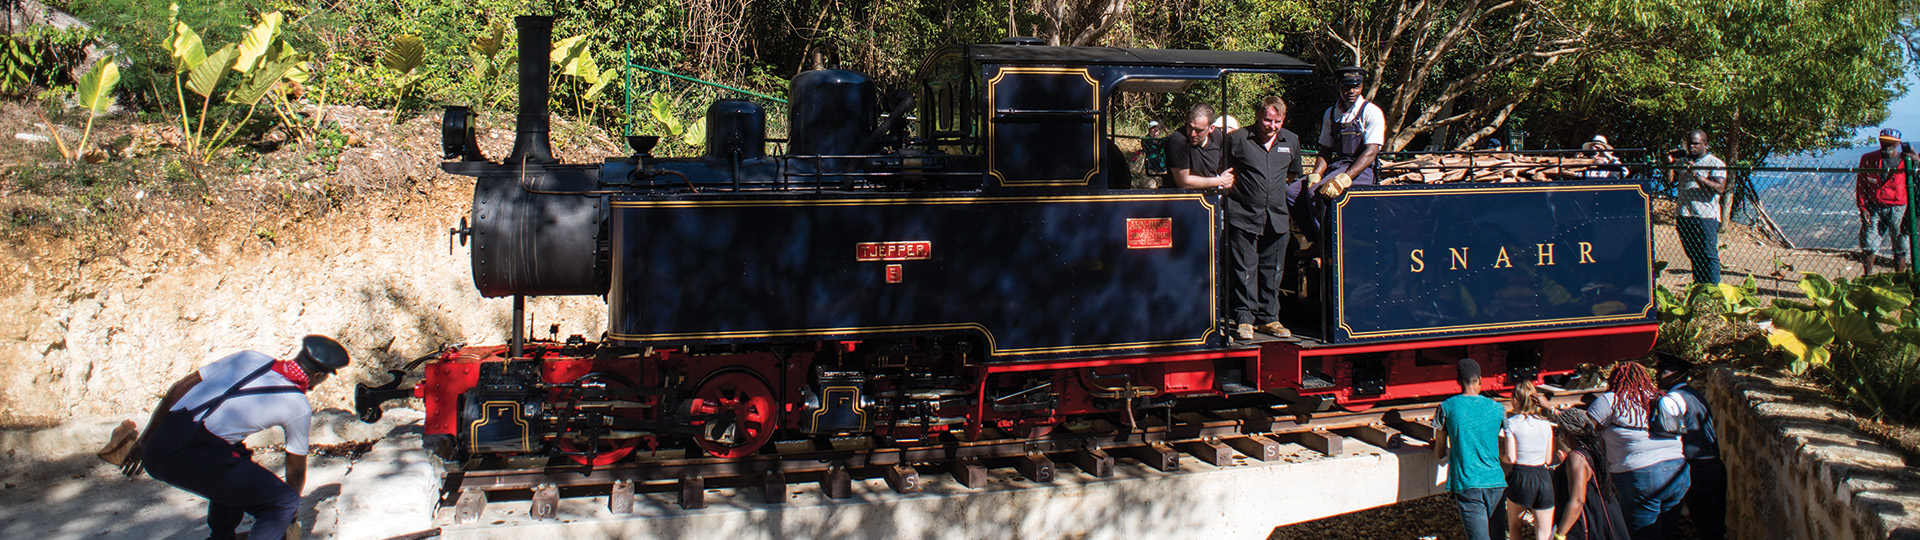 St  Nicholas Abbey Heritage Railway, Barbados